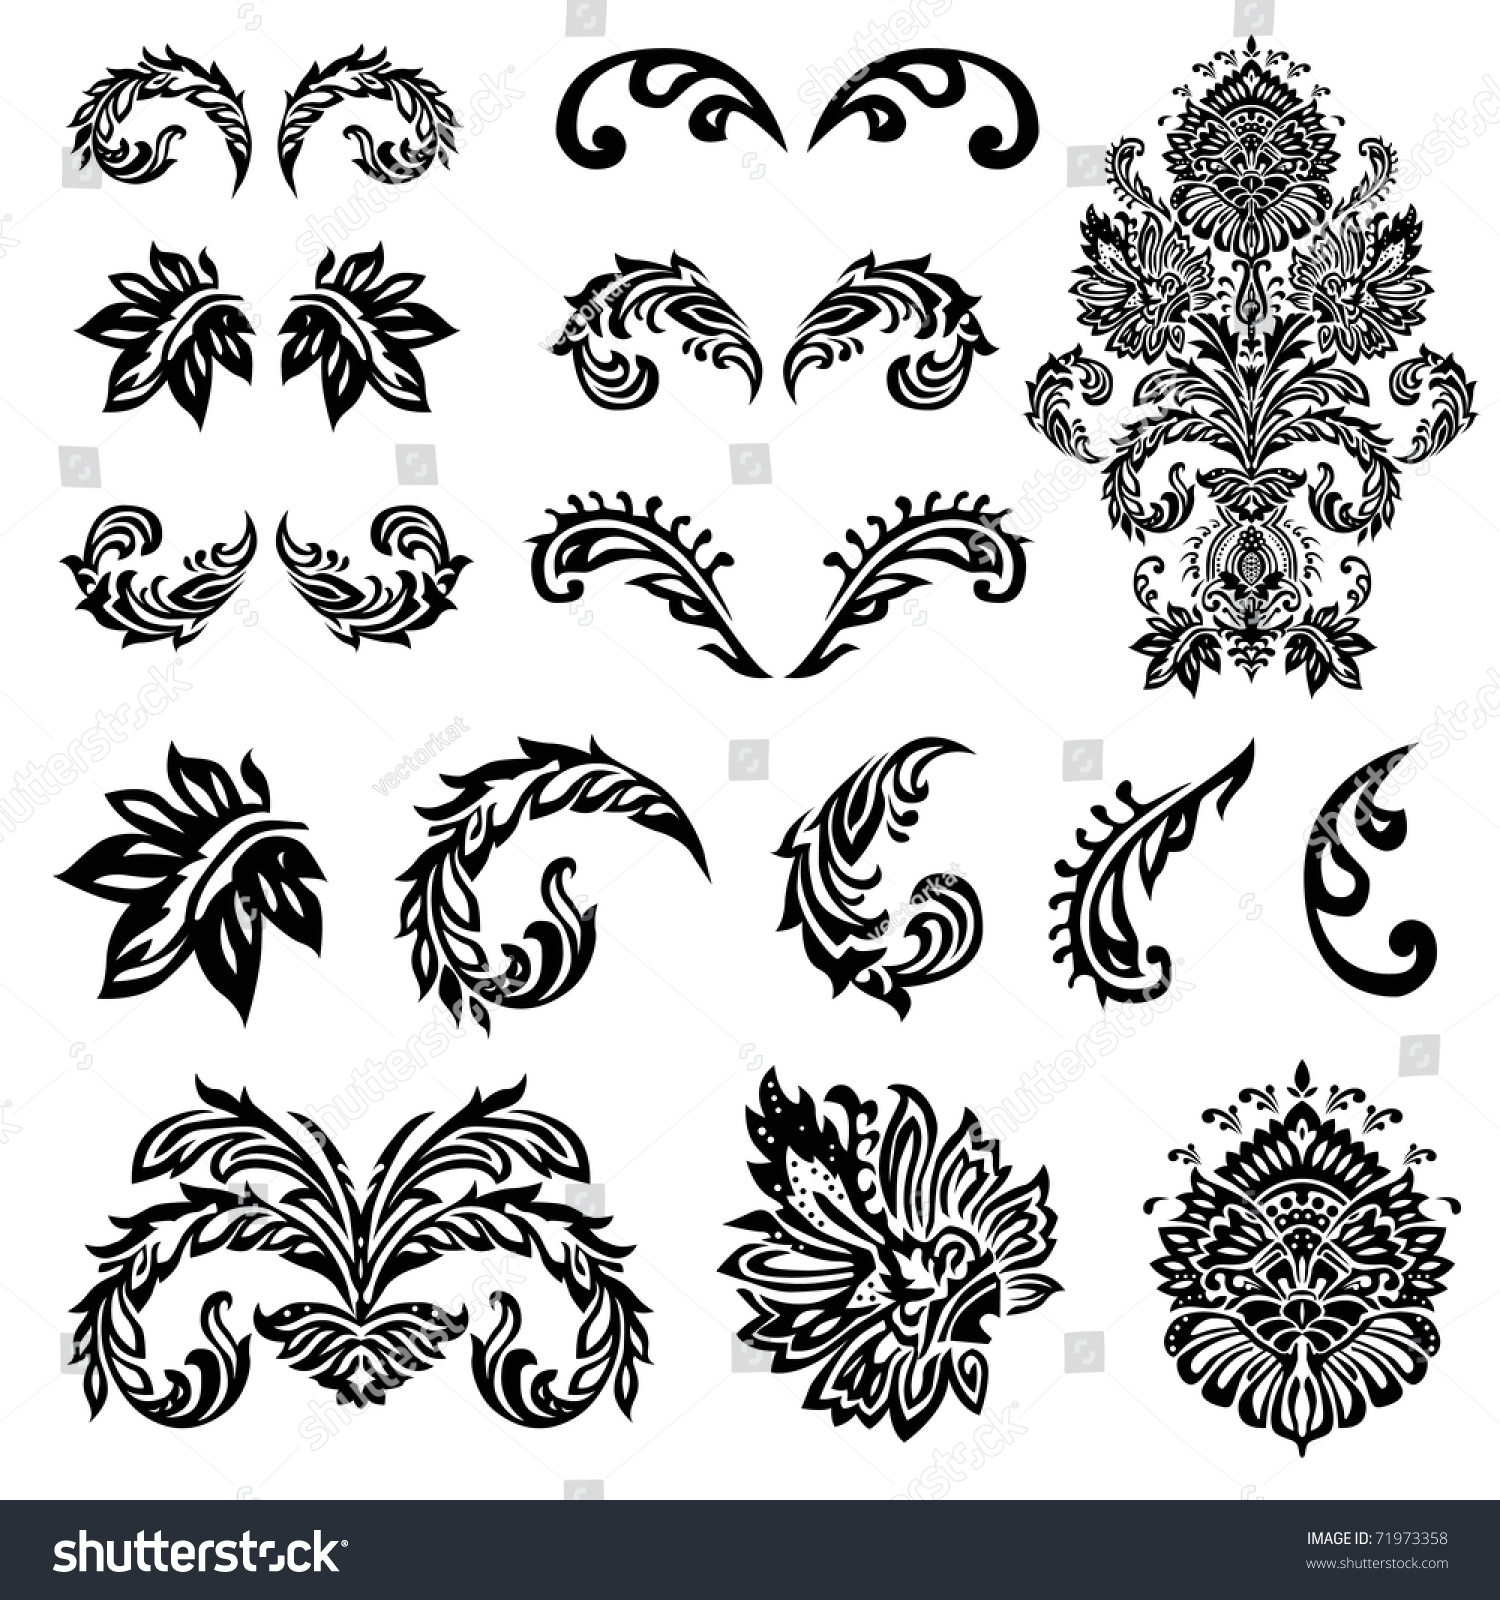 simple decorative patterns